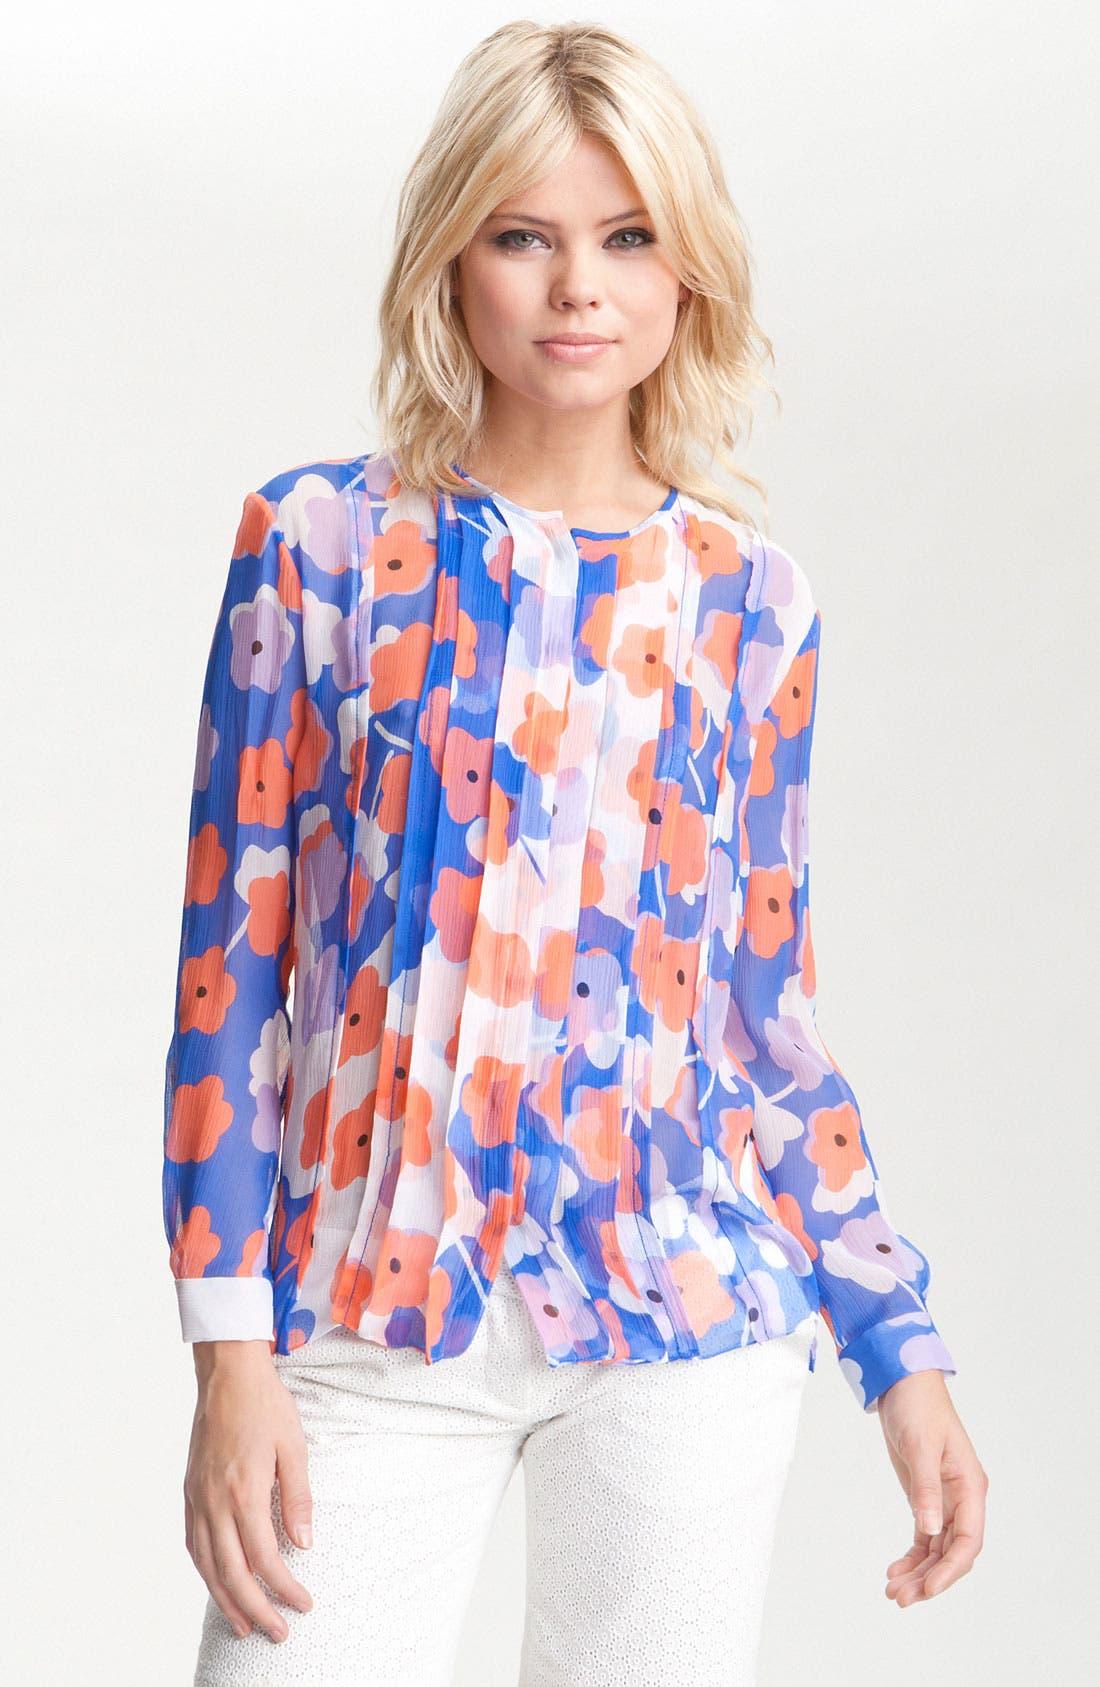 Alternate Image 1 Selected - Diane von Furstenberg 'Francesca' Sheer Print Silk Blouse